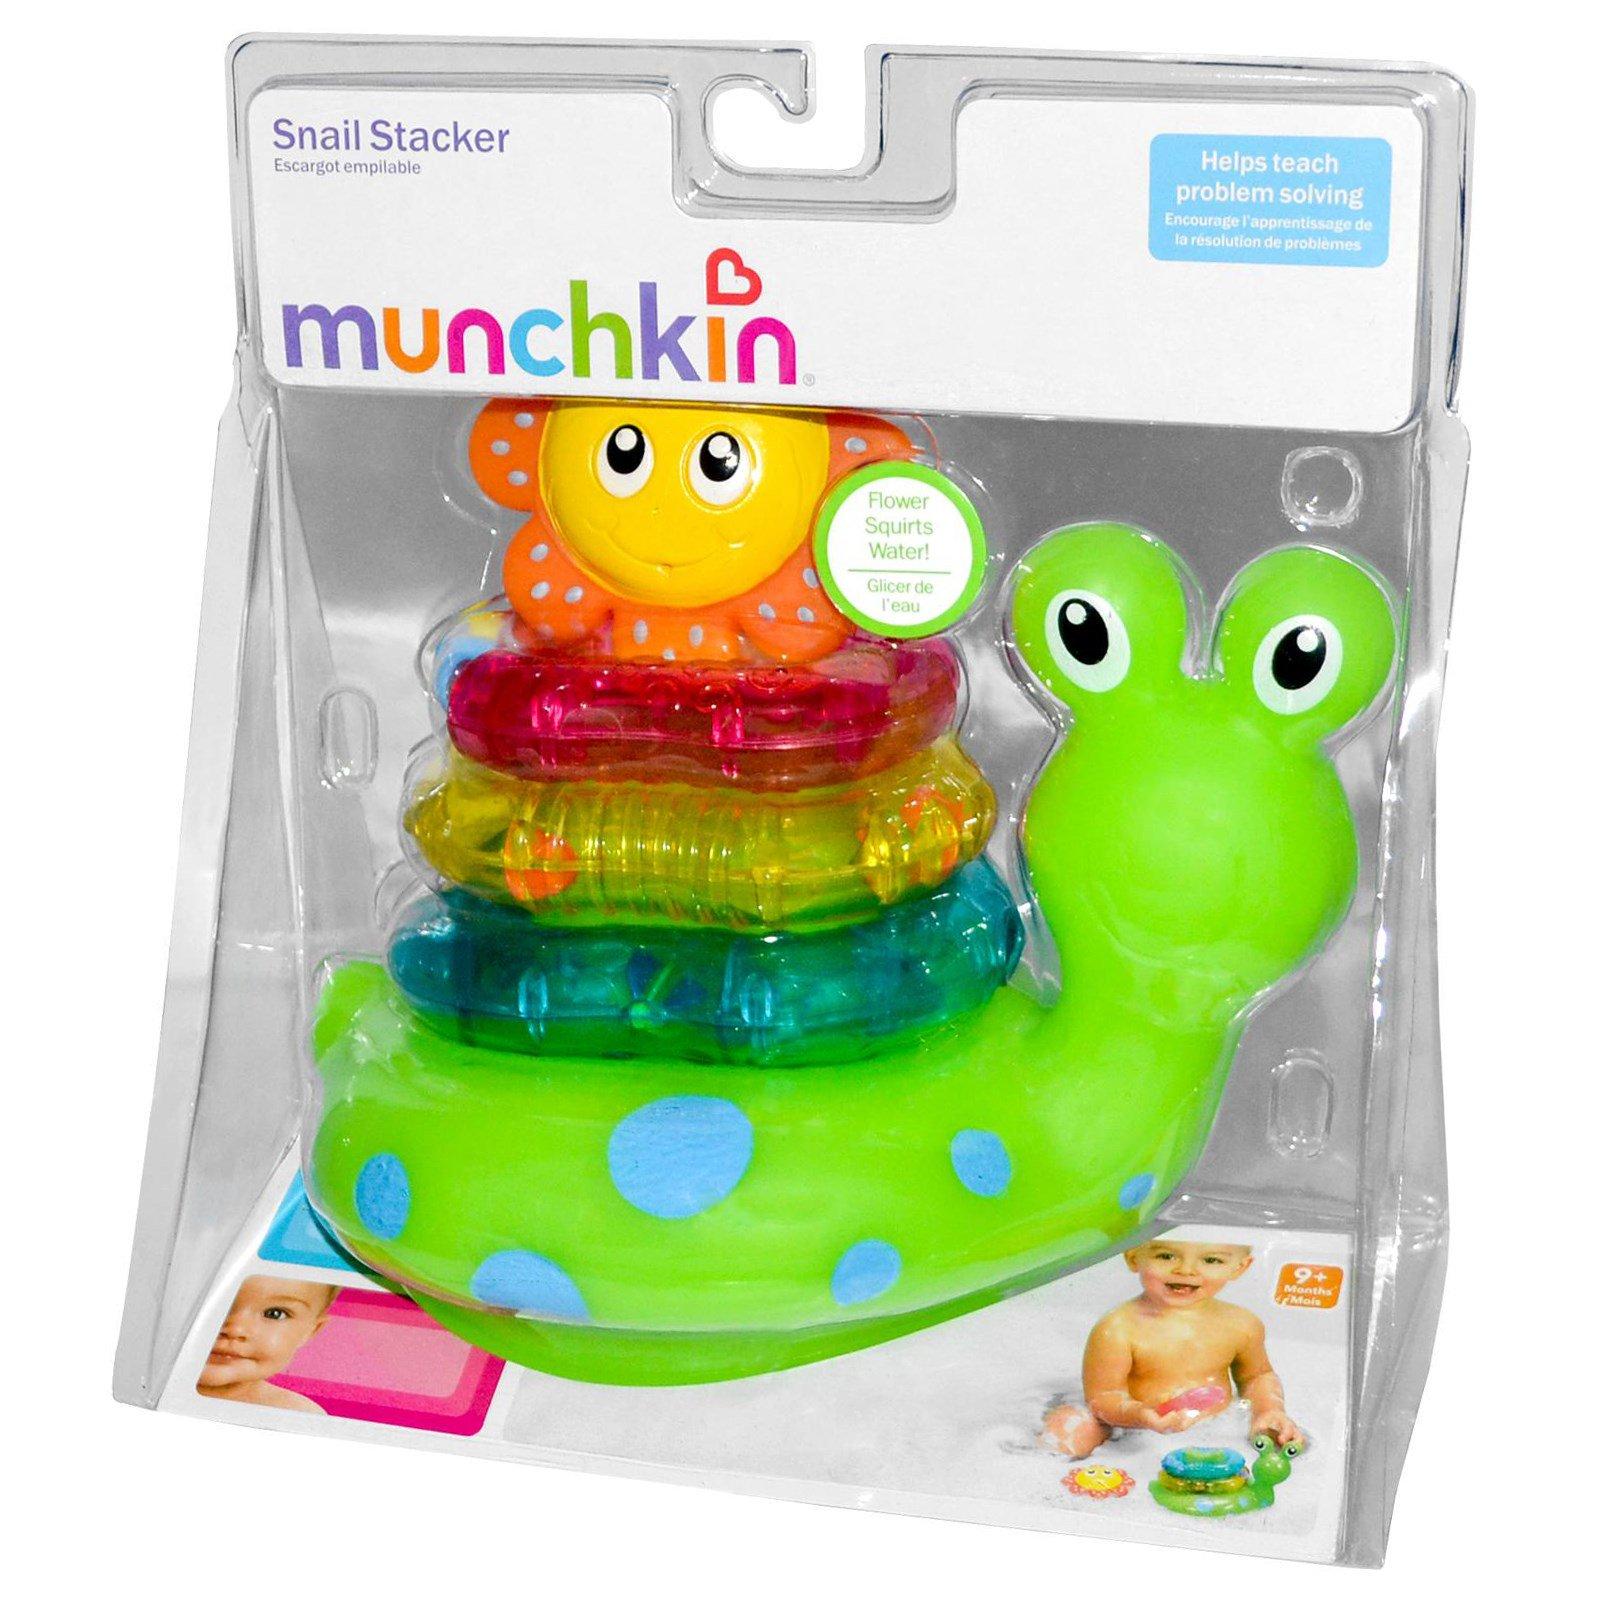 Munchkin, Snail Stacker Bath Toy, 9 +Months - iHerb.com